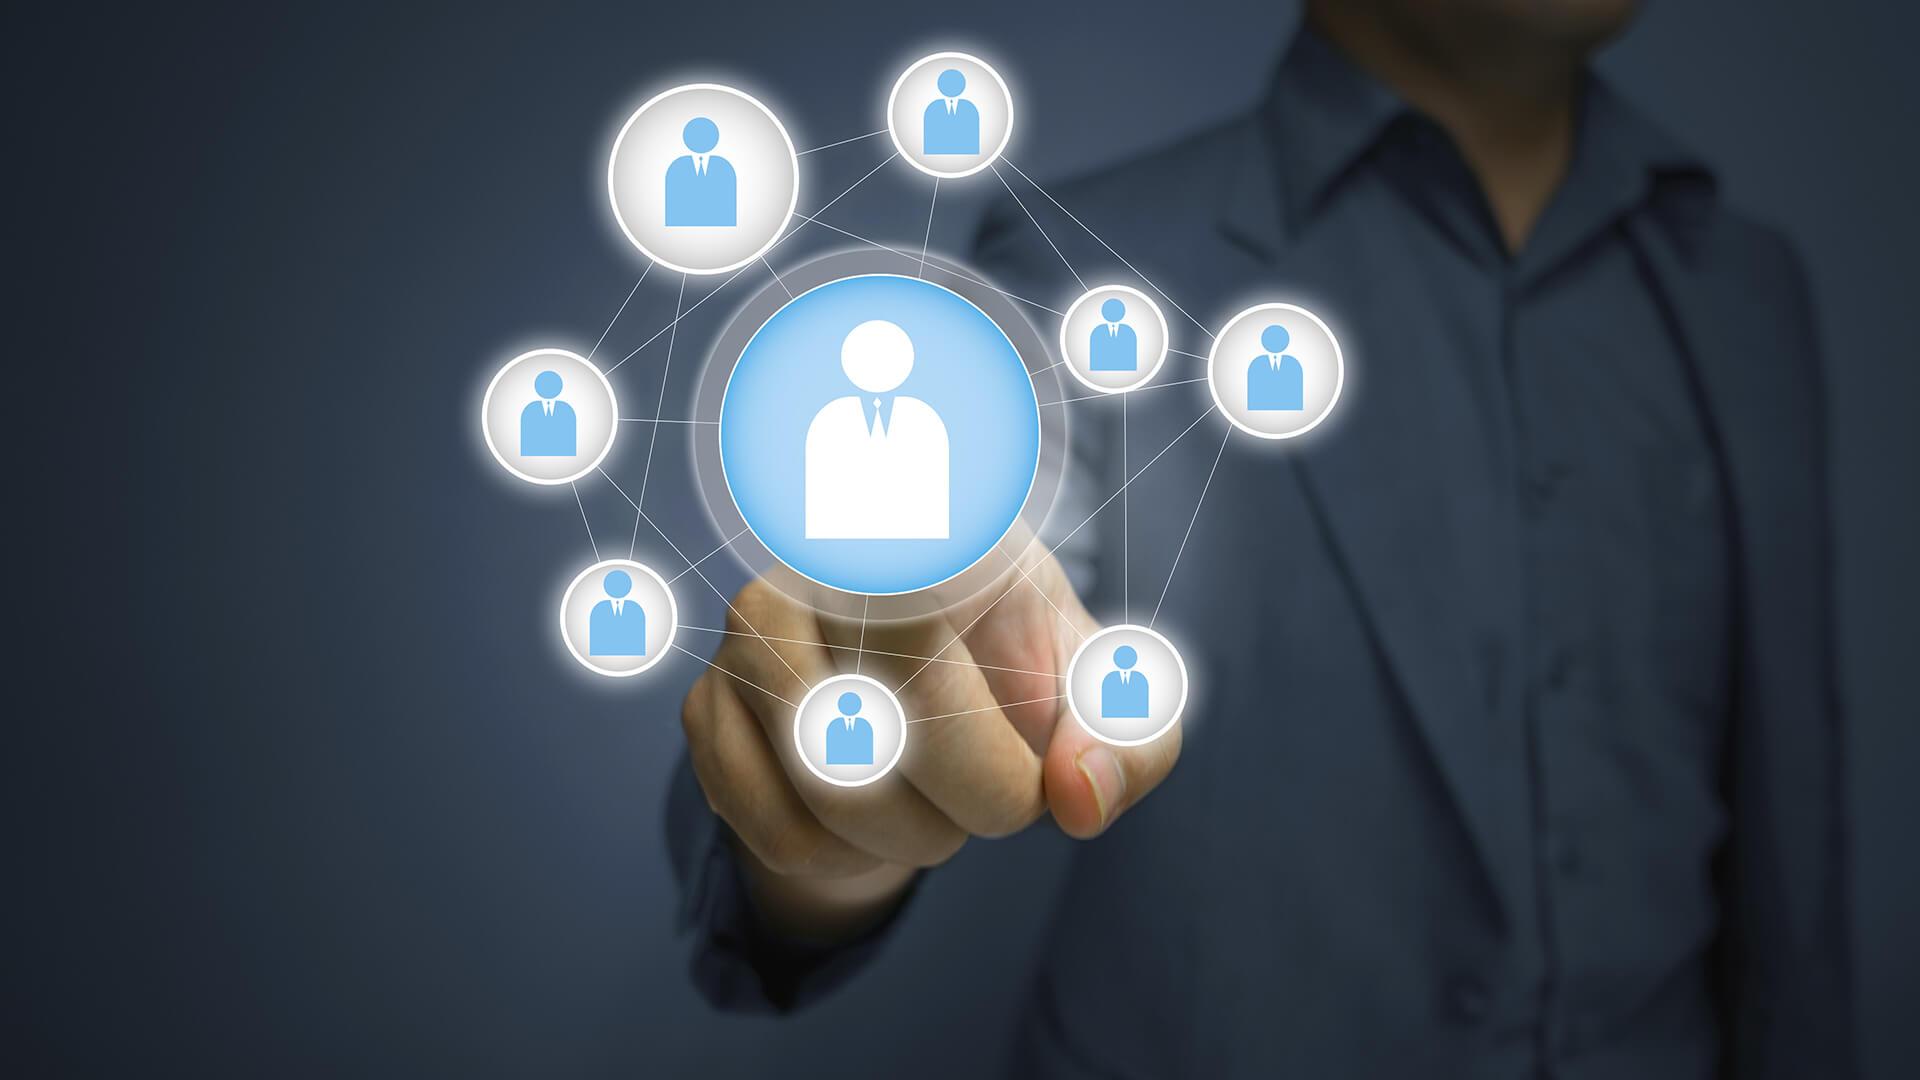 Consumer data services